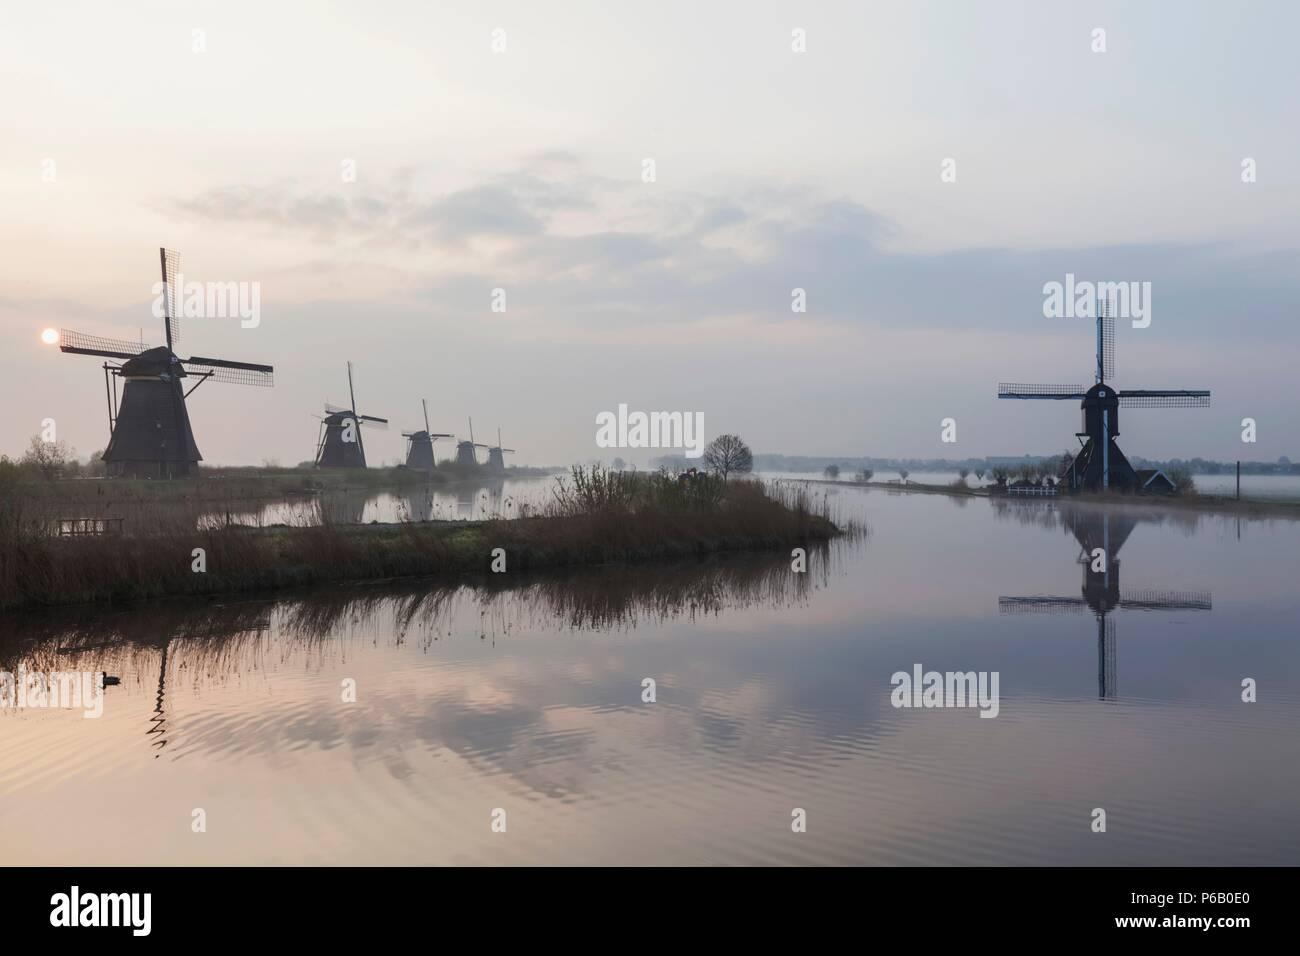 Europe, Netherlands, Alblasserdam, Kinderdijk, Windmills - Stock Image